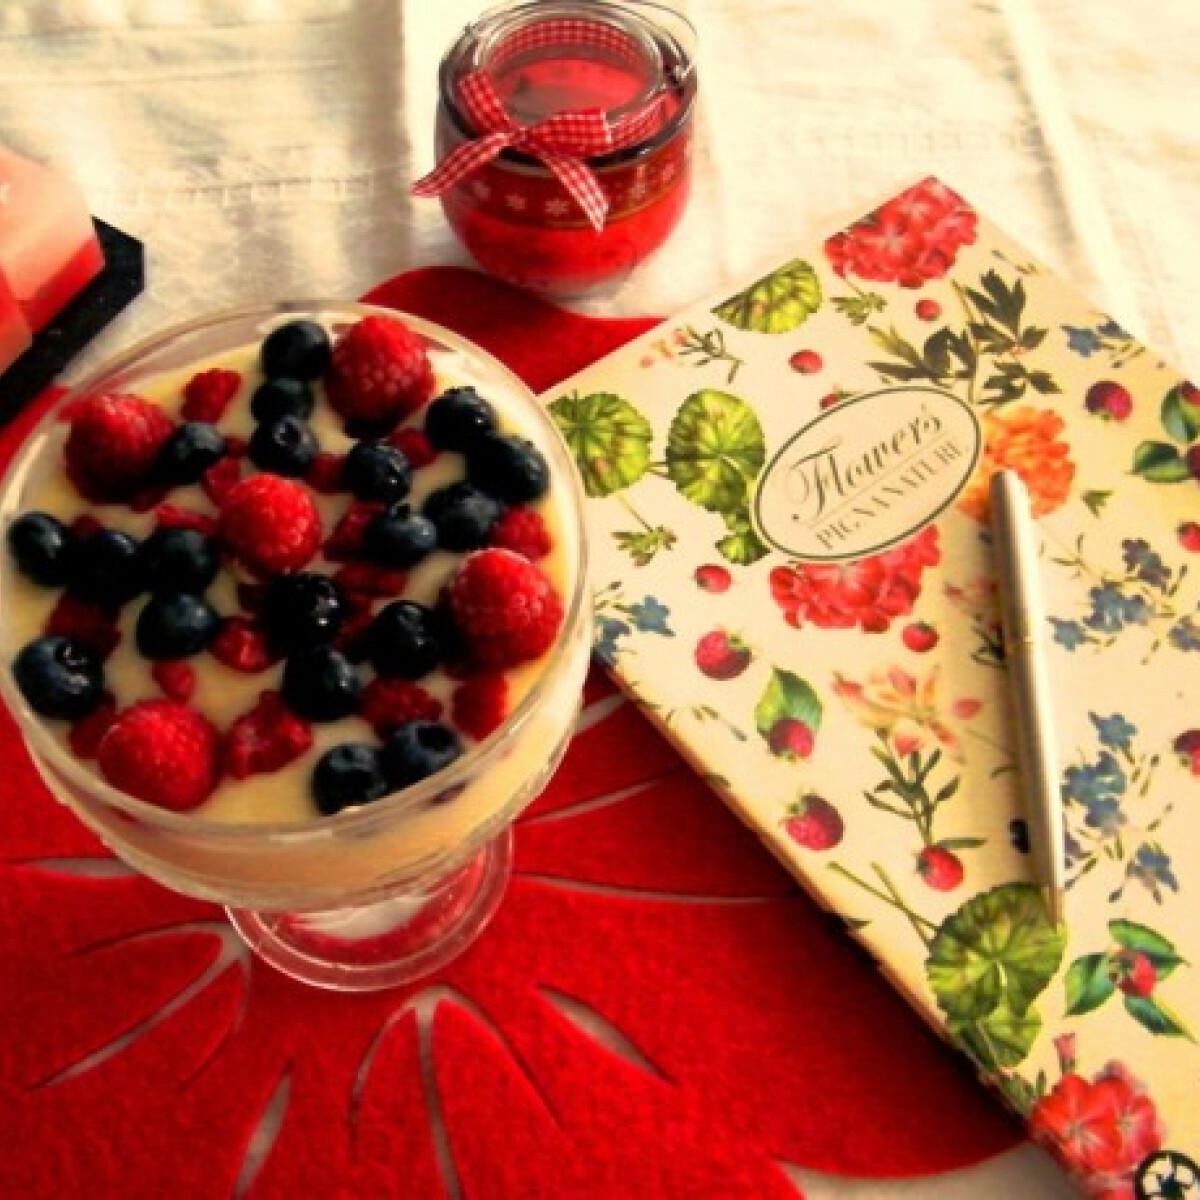 Citromos joghurtos puding gyümölccsel